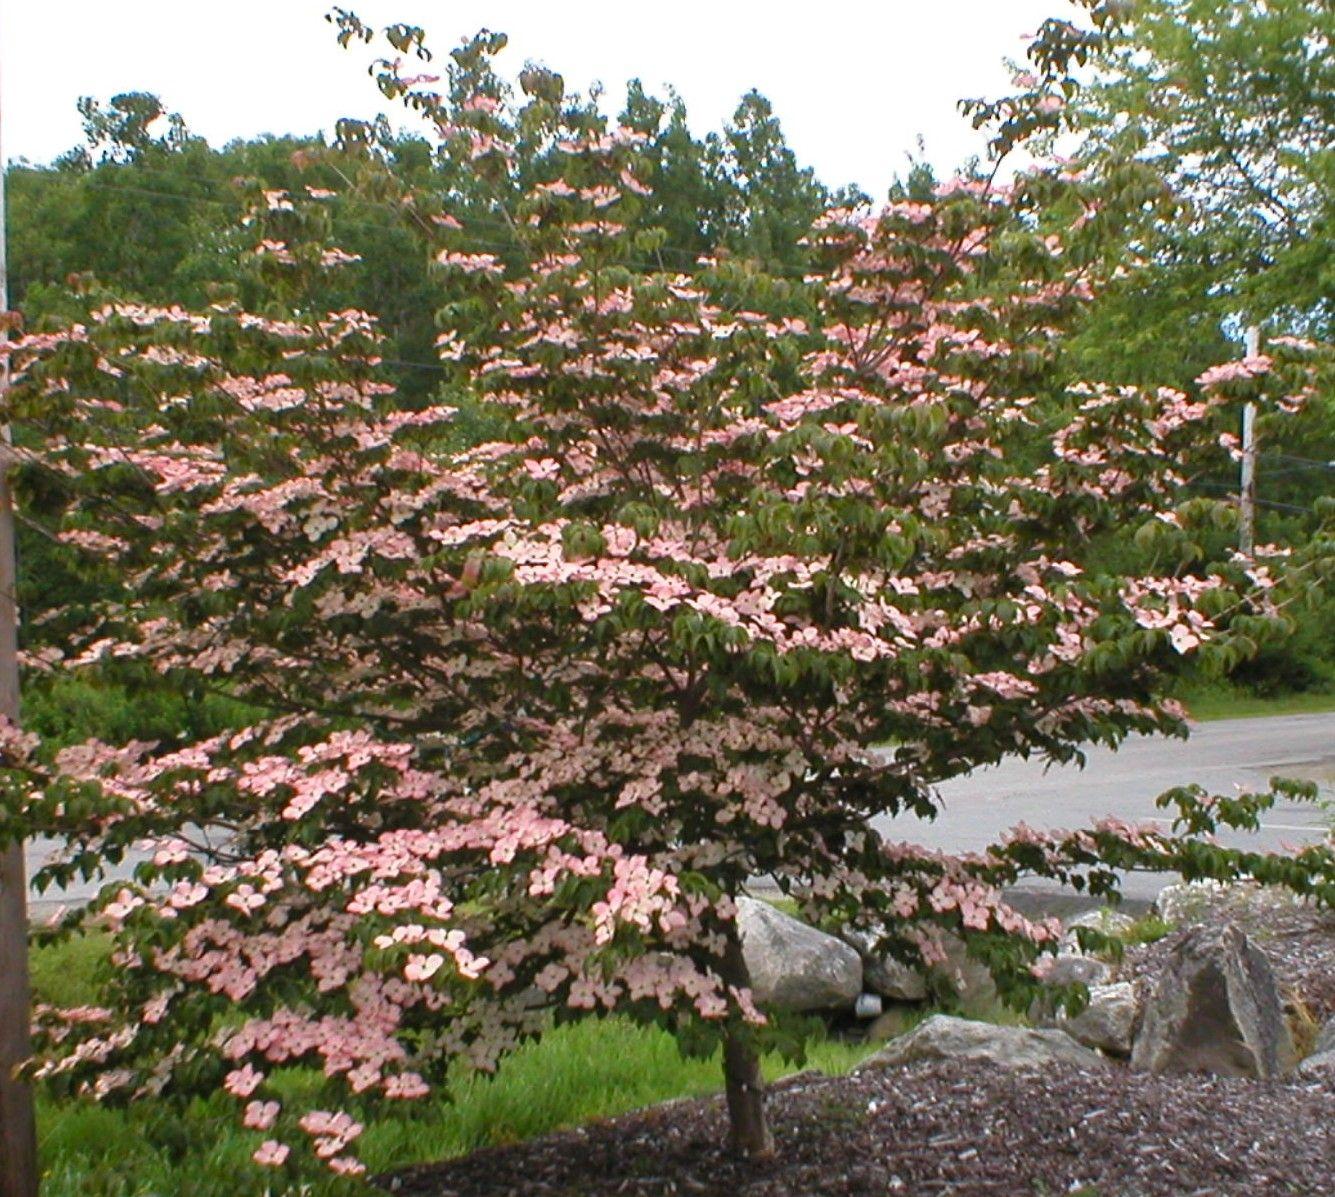 Pink dogwood leaves